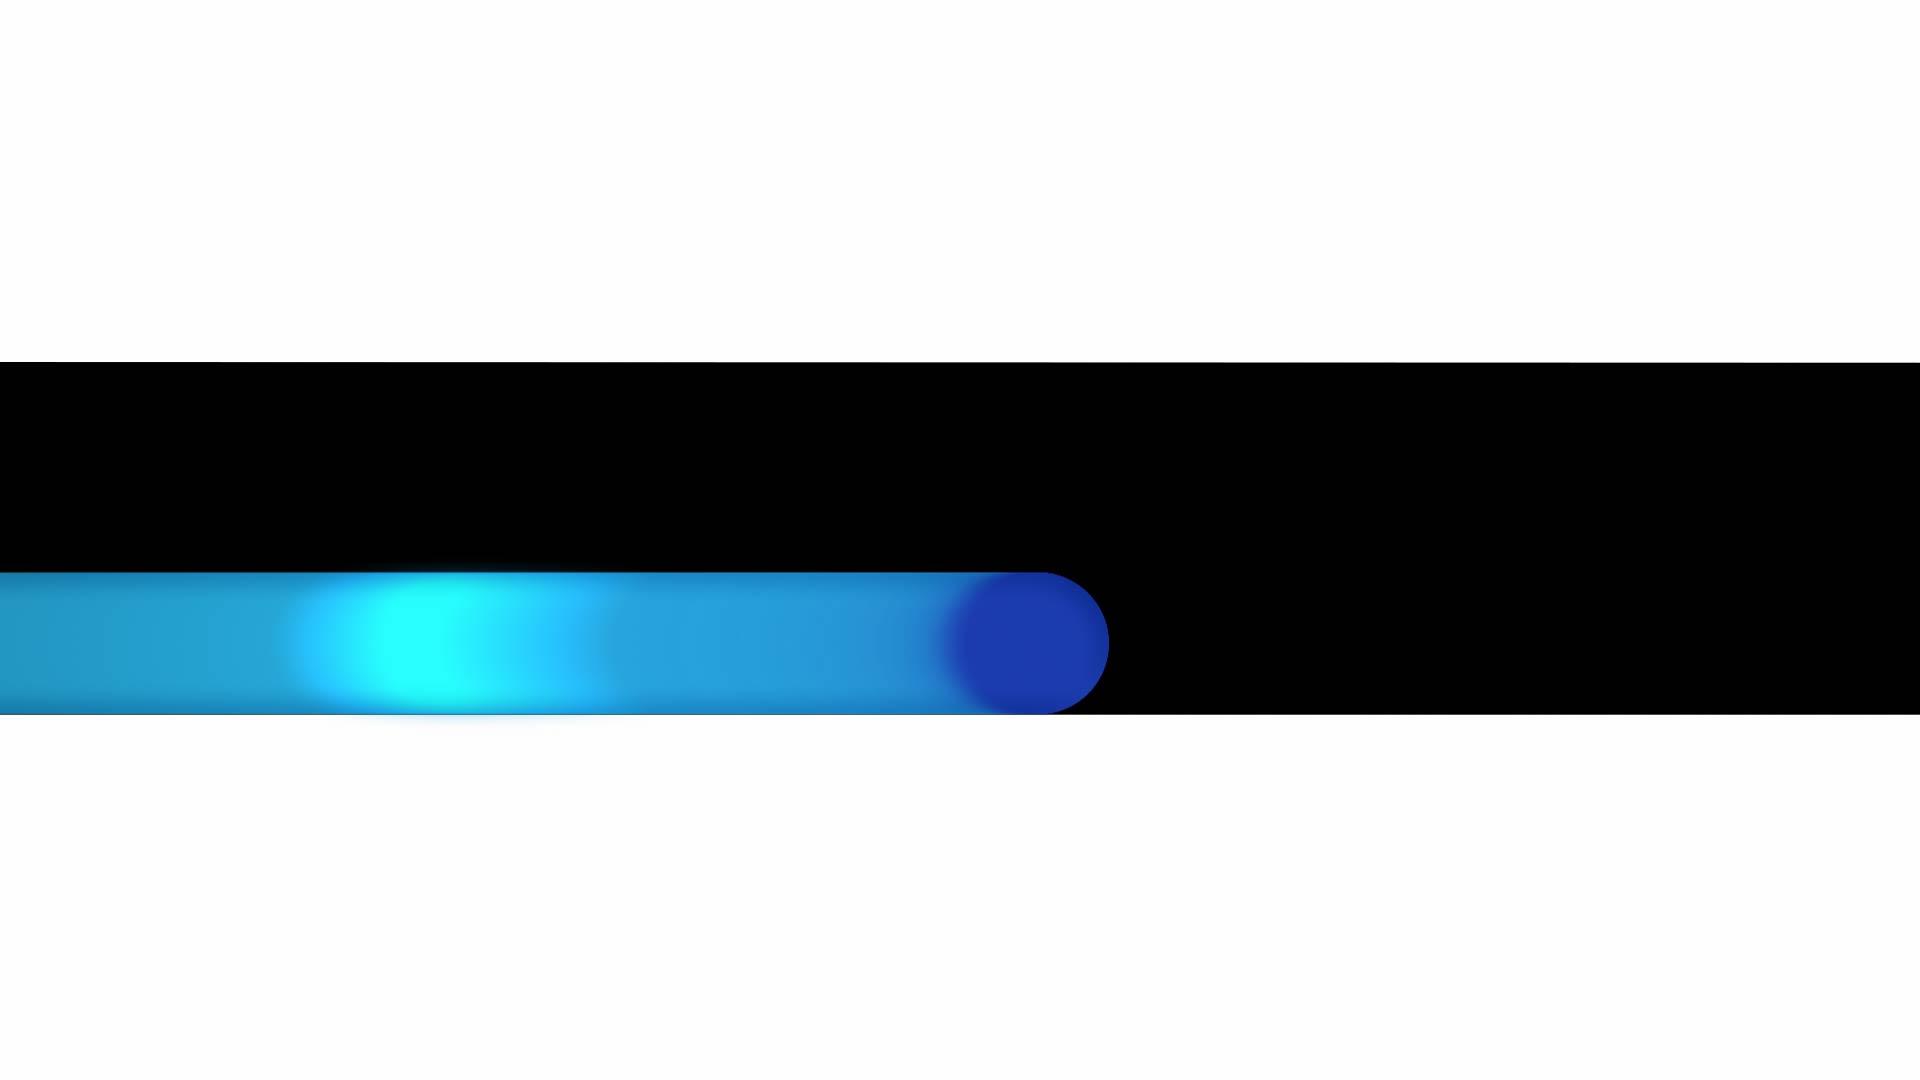 Watson_master_stems_20180315 (1-00-04-10).jpg